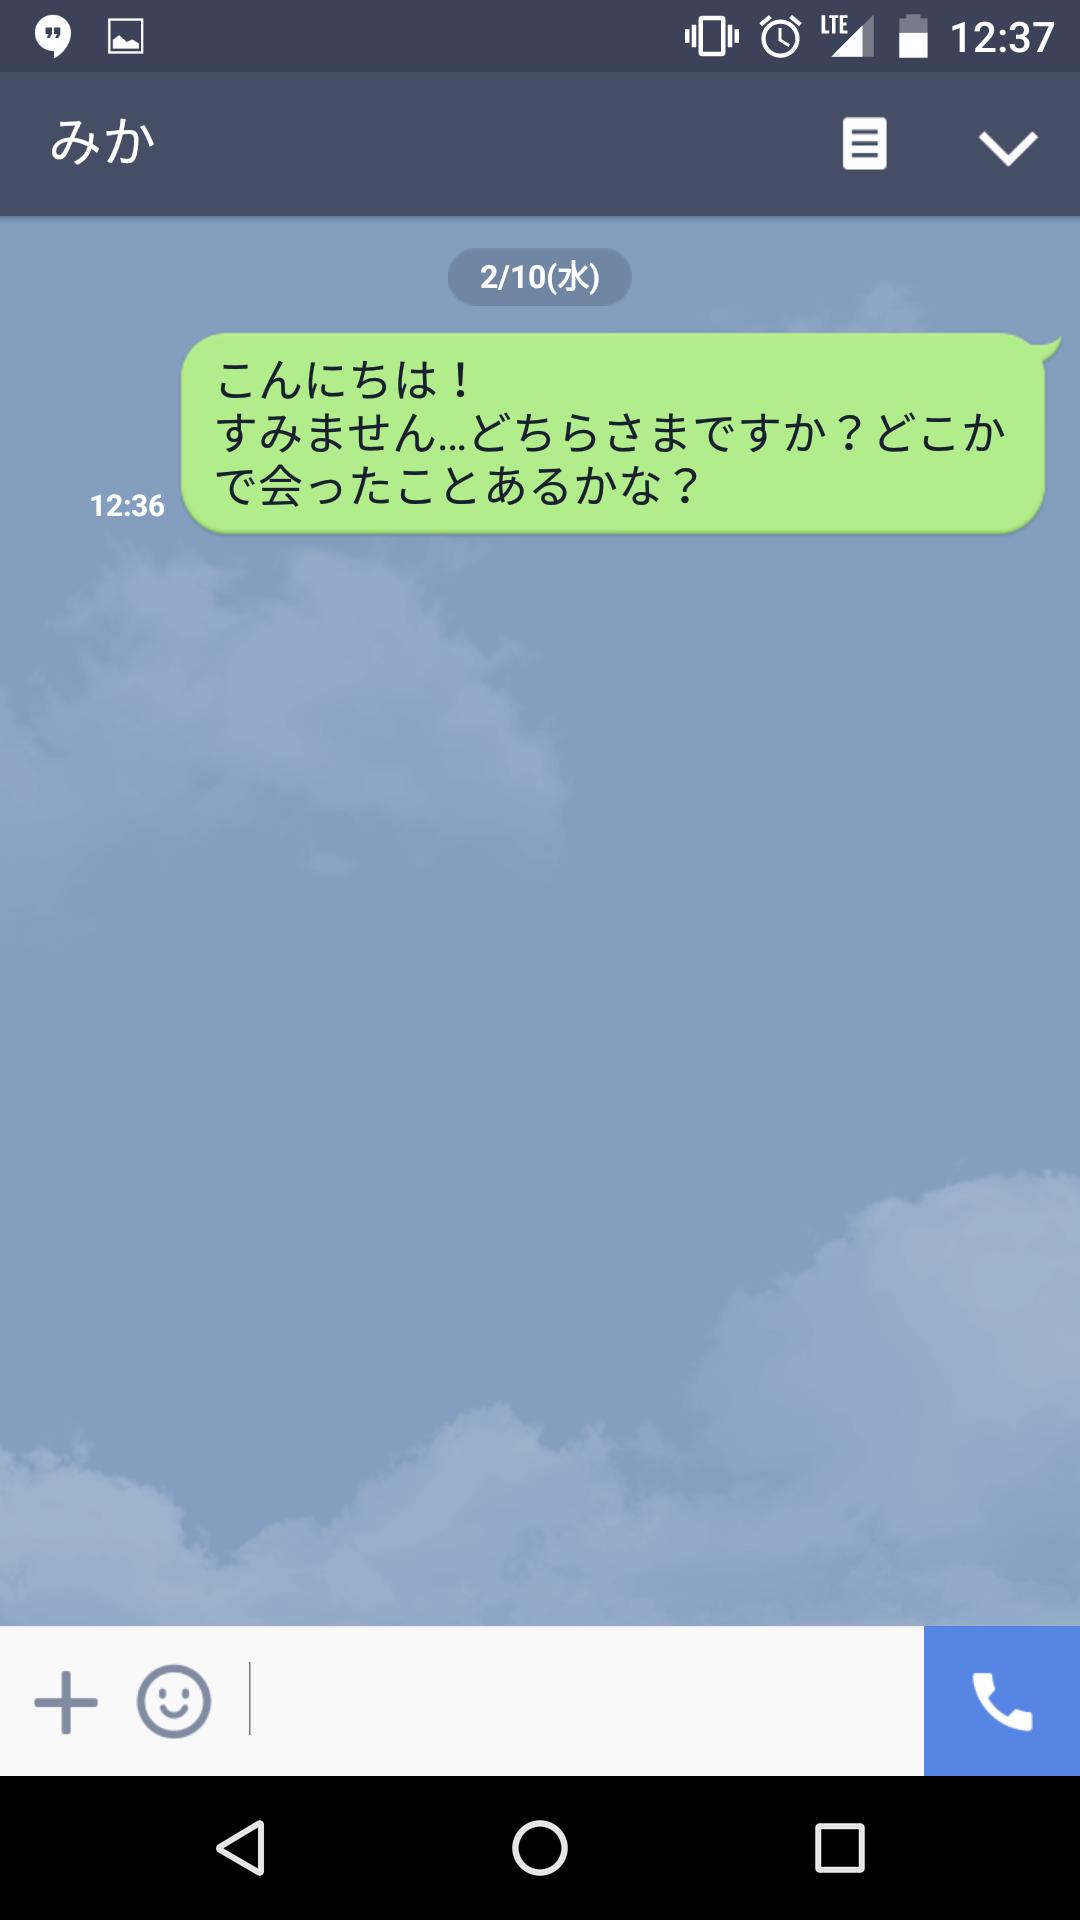 Screenshot_20160210-123725